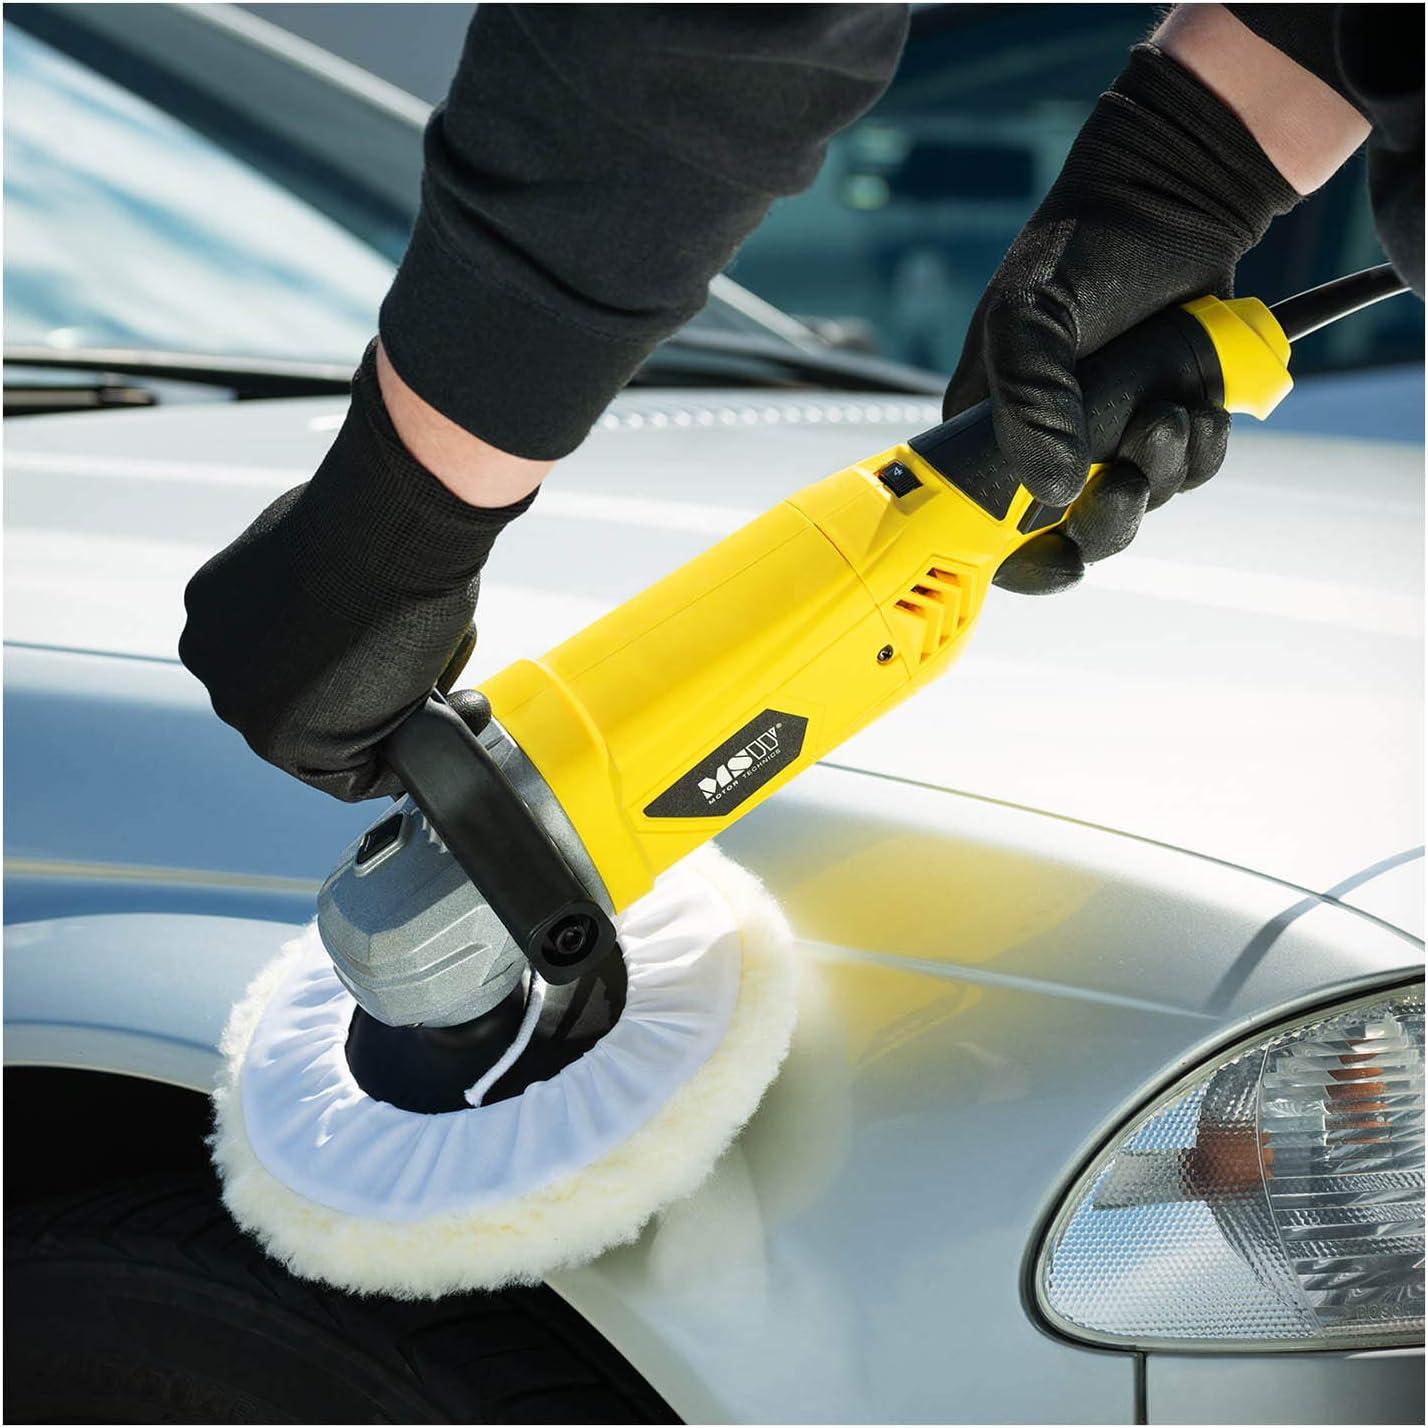 6 Speed Settings, Polishing Disc Diameter 180mm MSW Car Polisher Orbital Speed Polisher Car Polishing Machine 1200W 3300rpm MSW-ECP1200